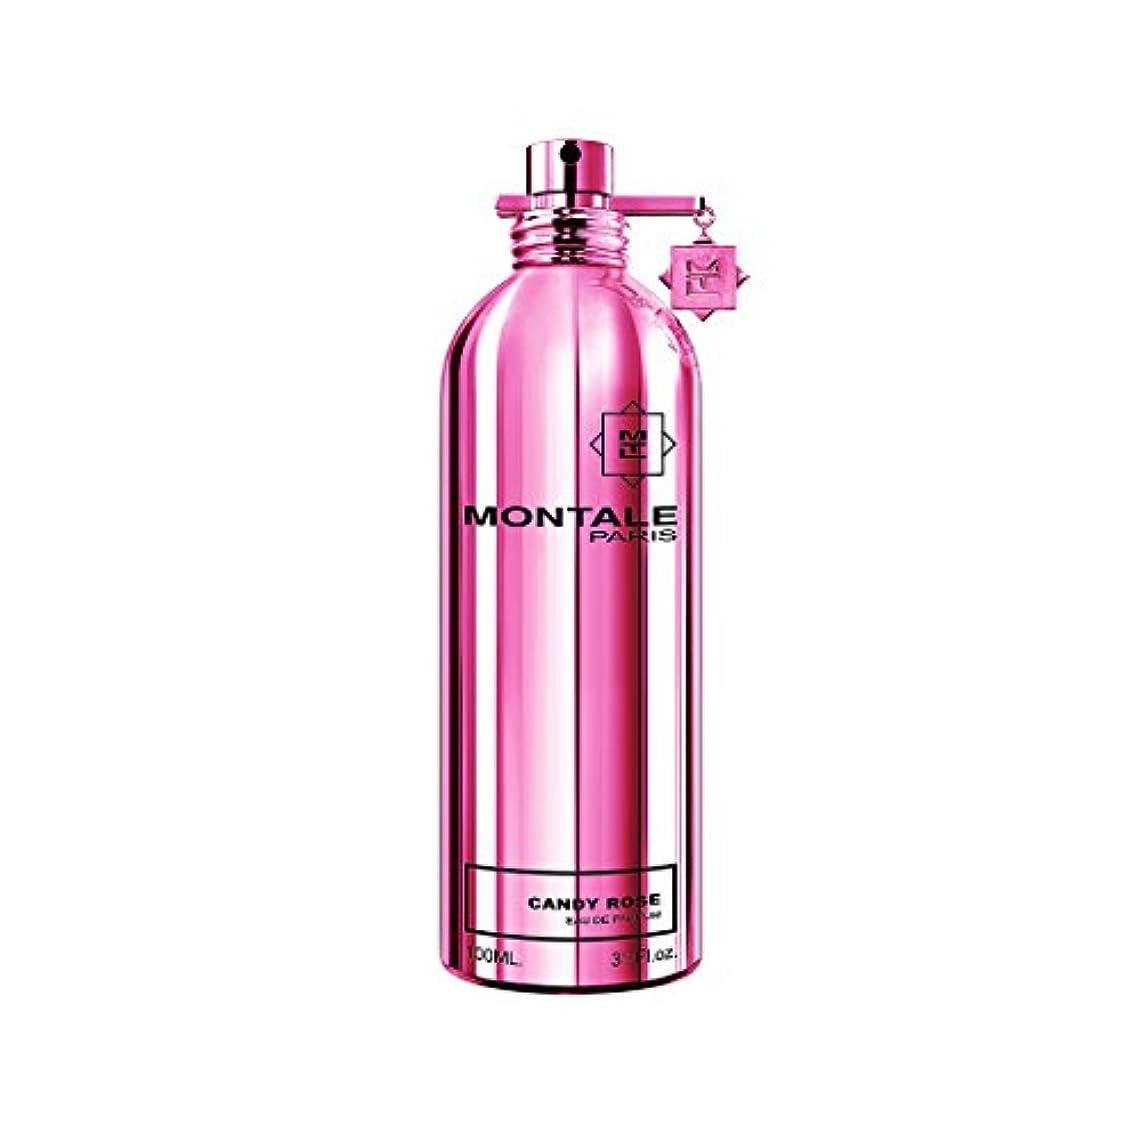 種類大臣教Montale Candy Rose by Montale Eau De Parfum Spray 3.4 oz / 100 ml (Women)